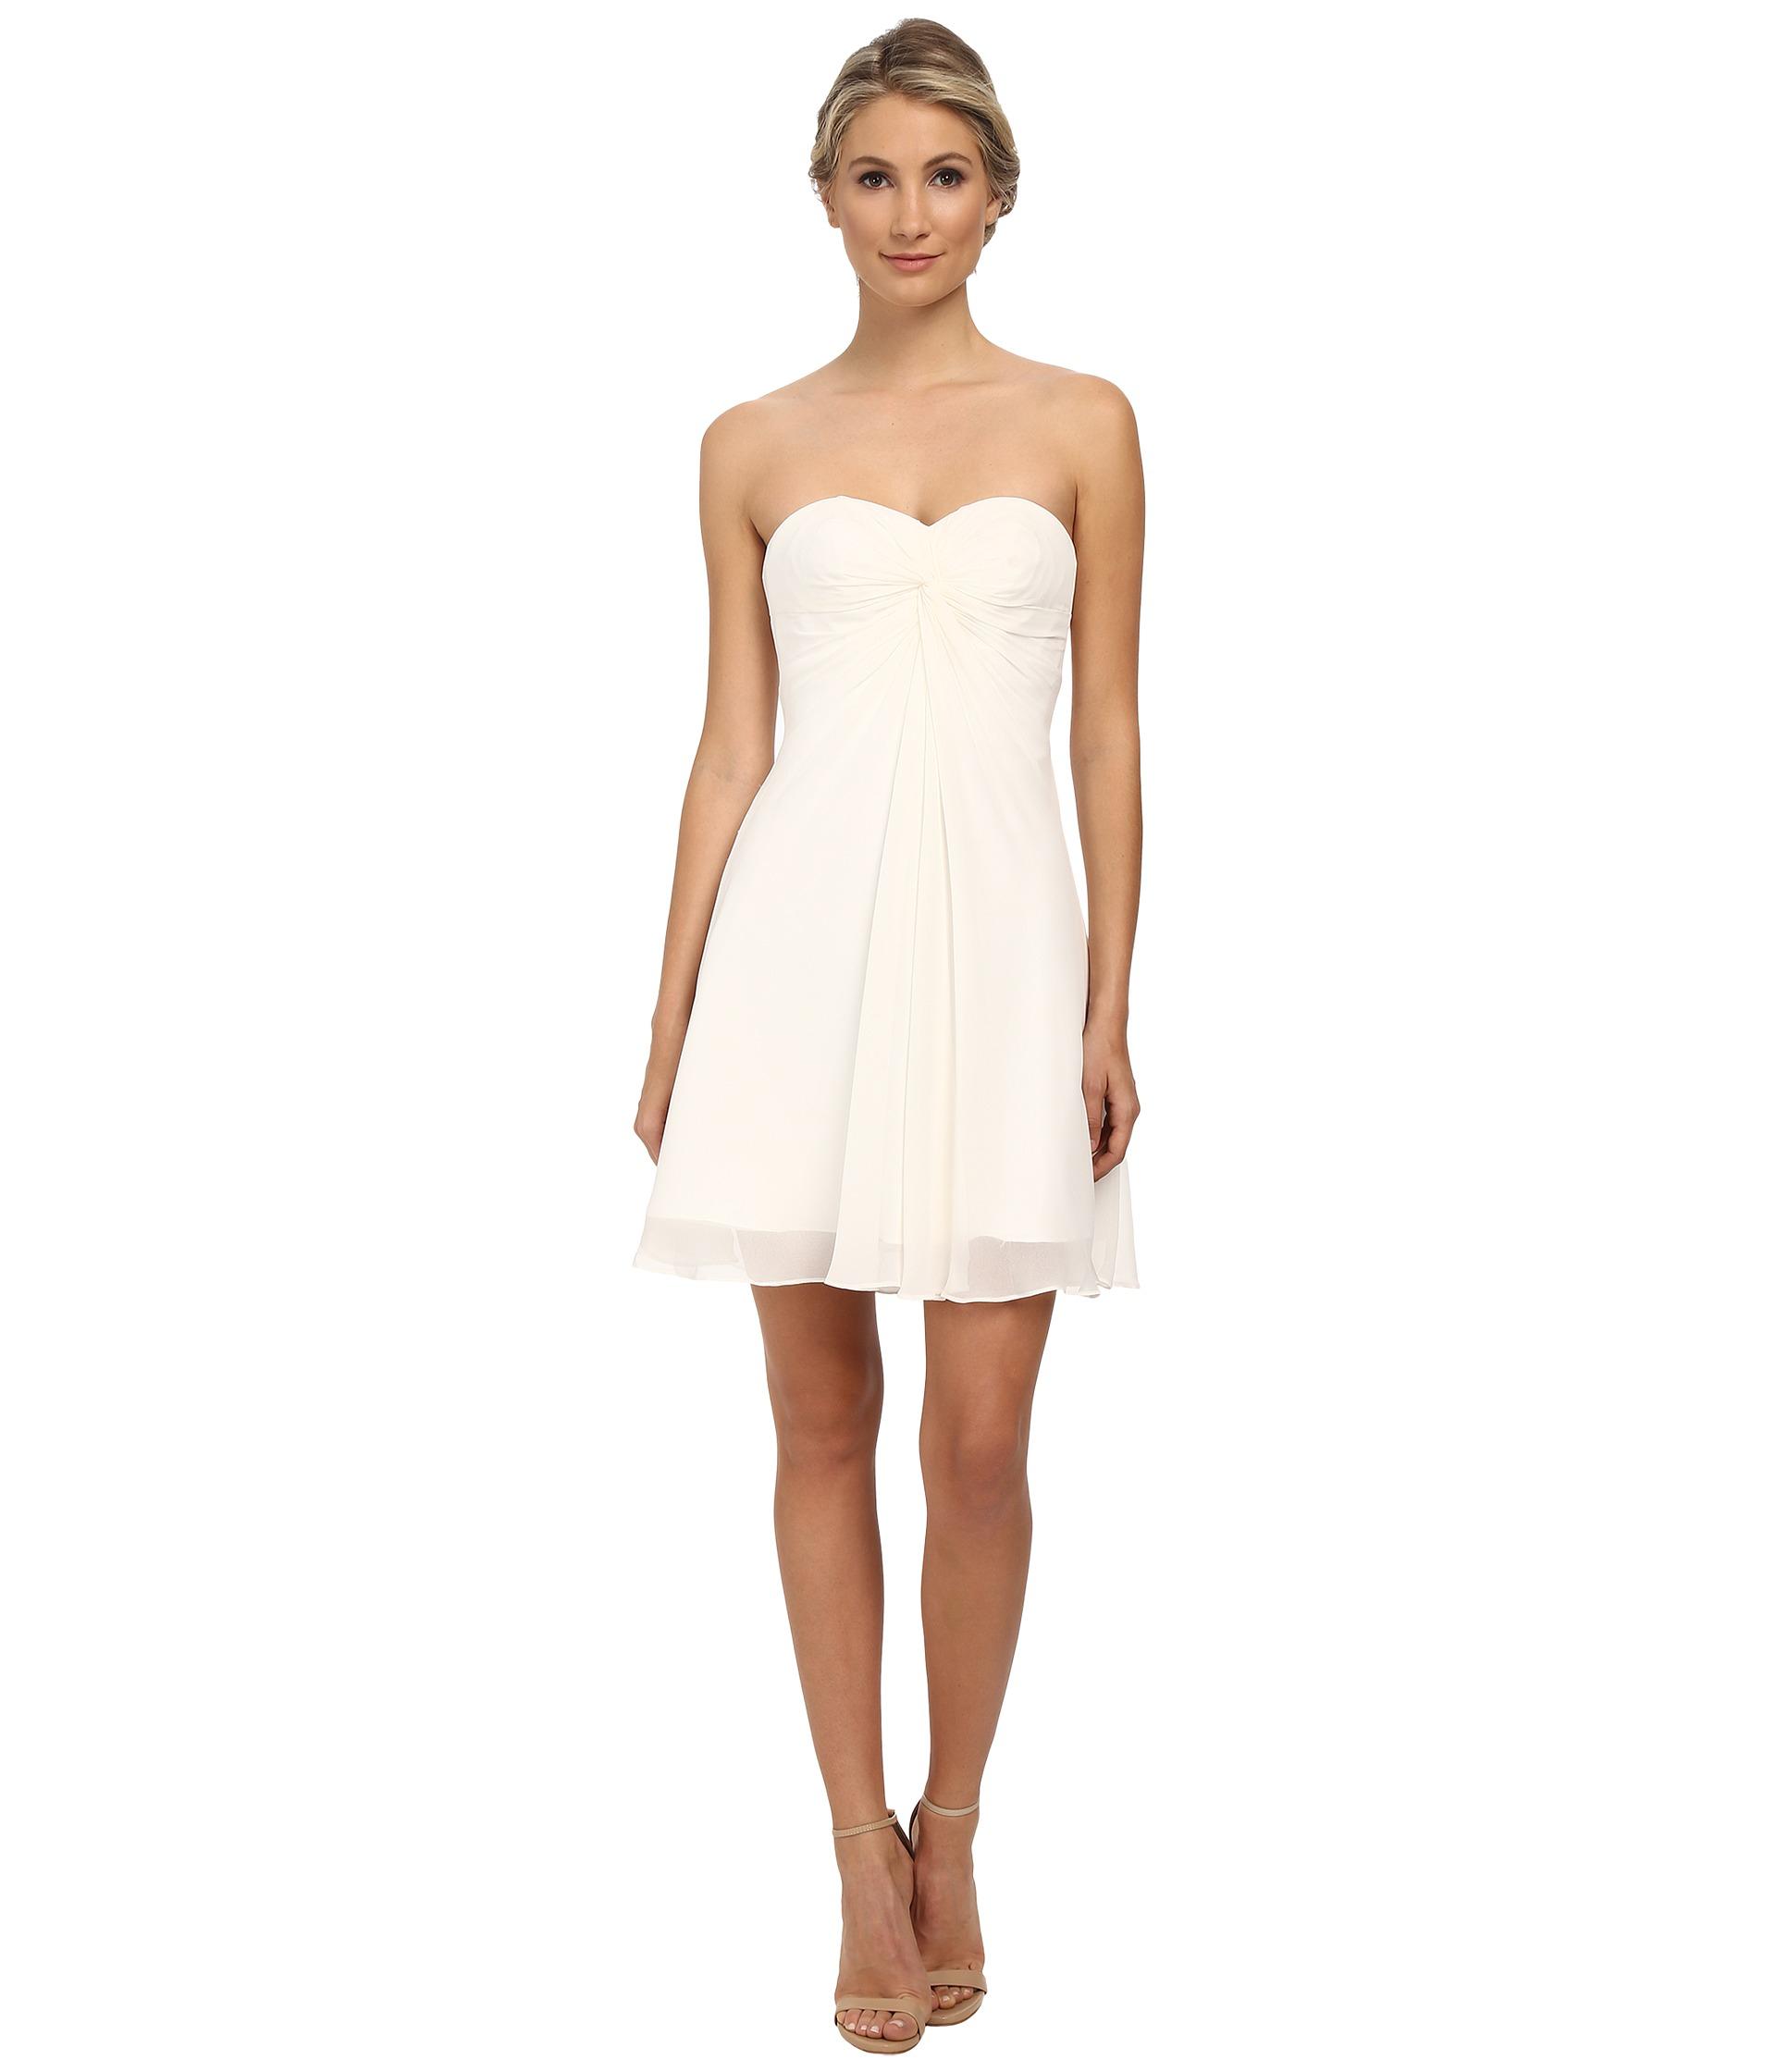 Faviana Short Chiffon Corset Dress 7650 in White (Ivory ...